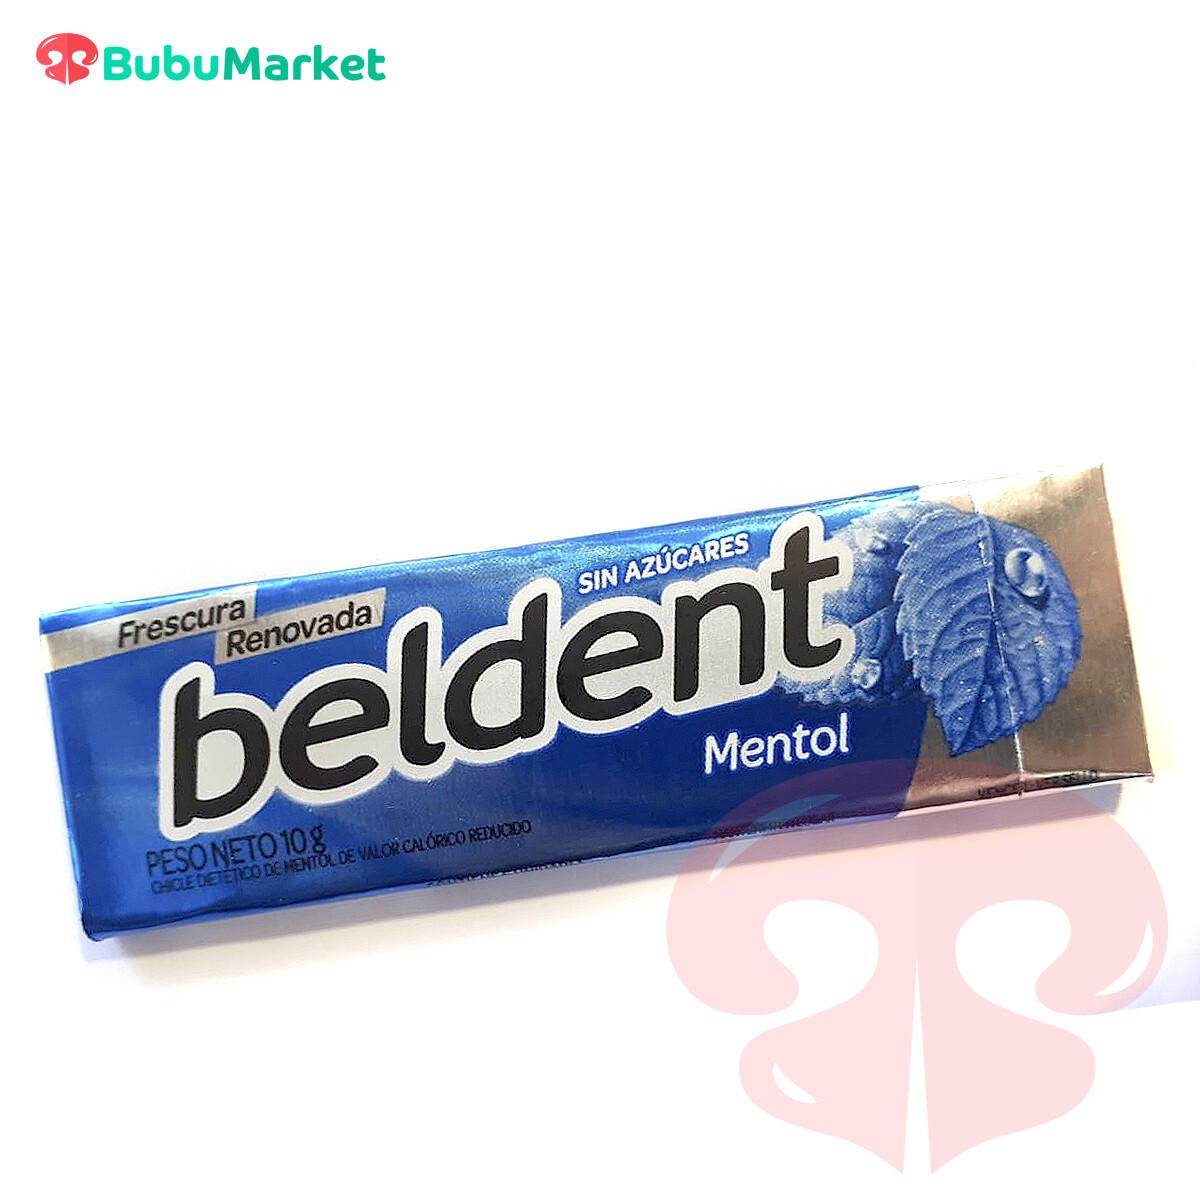 BELDENT, GOMA DE MASCAR SABOR MENTOL SIN AZUCAR